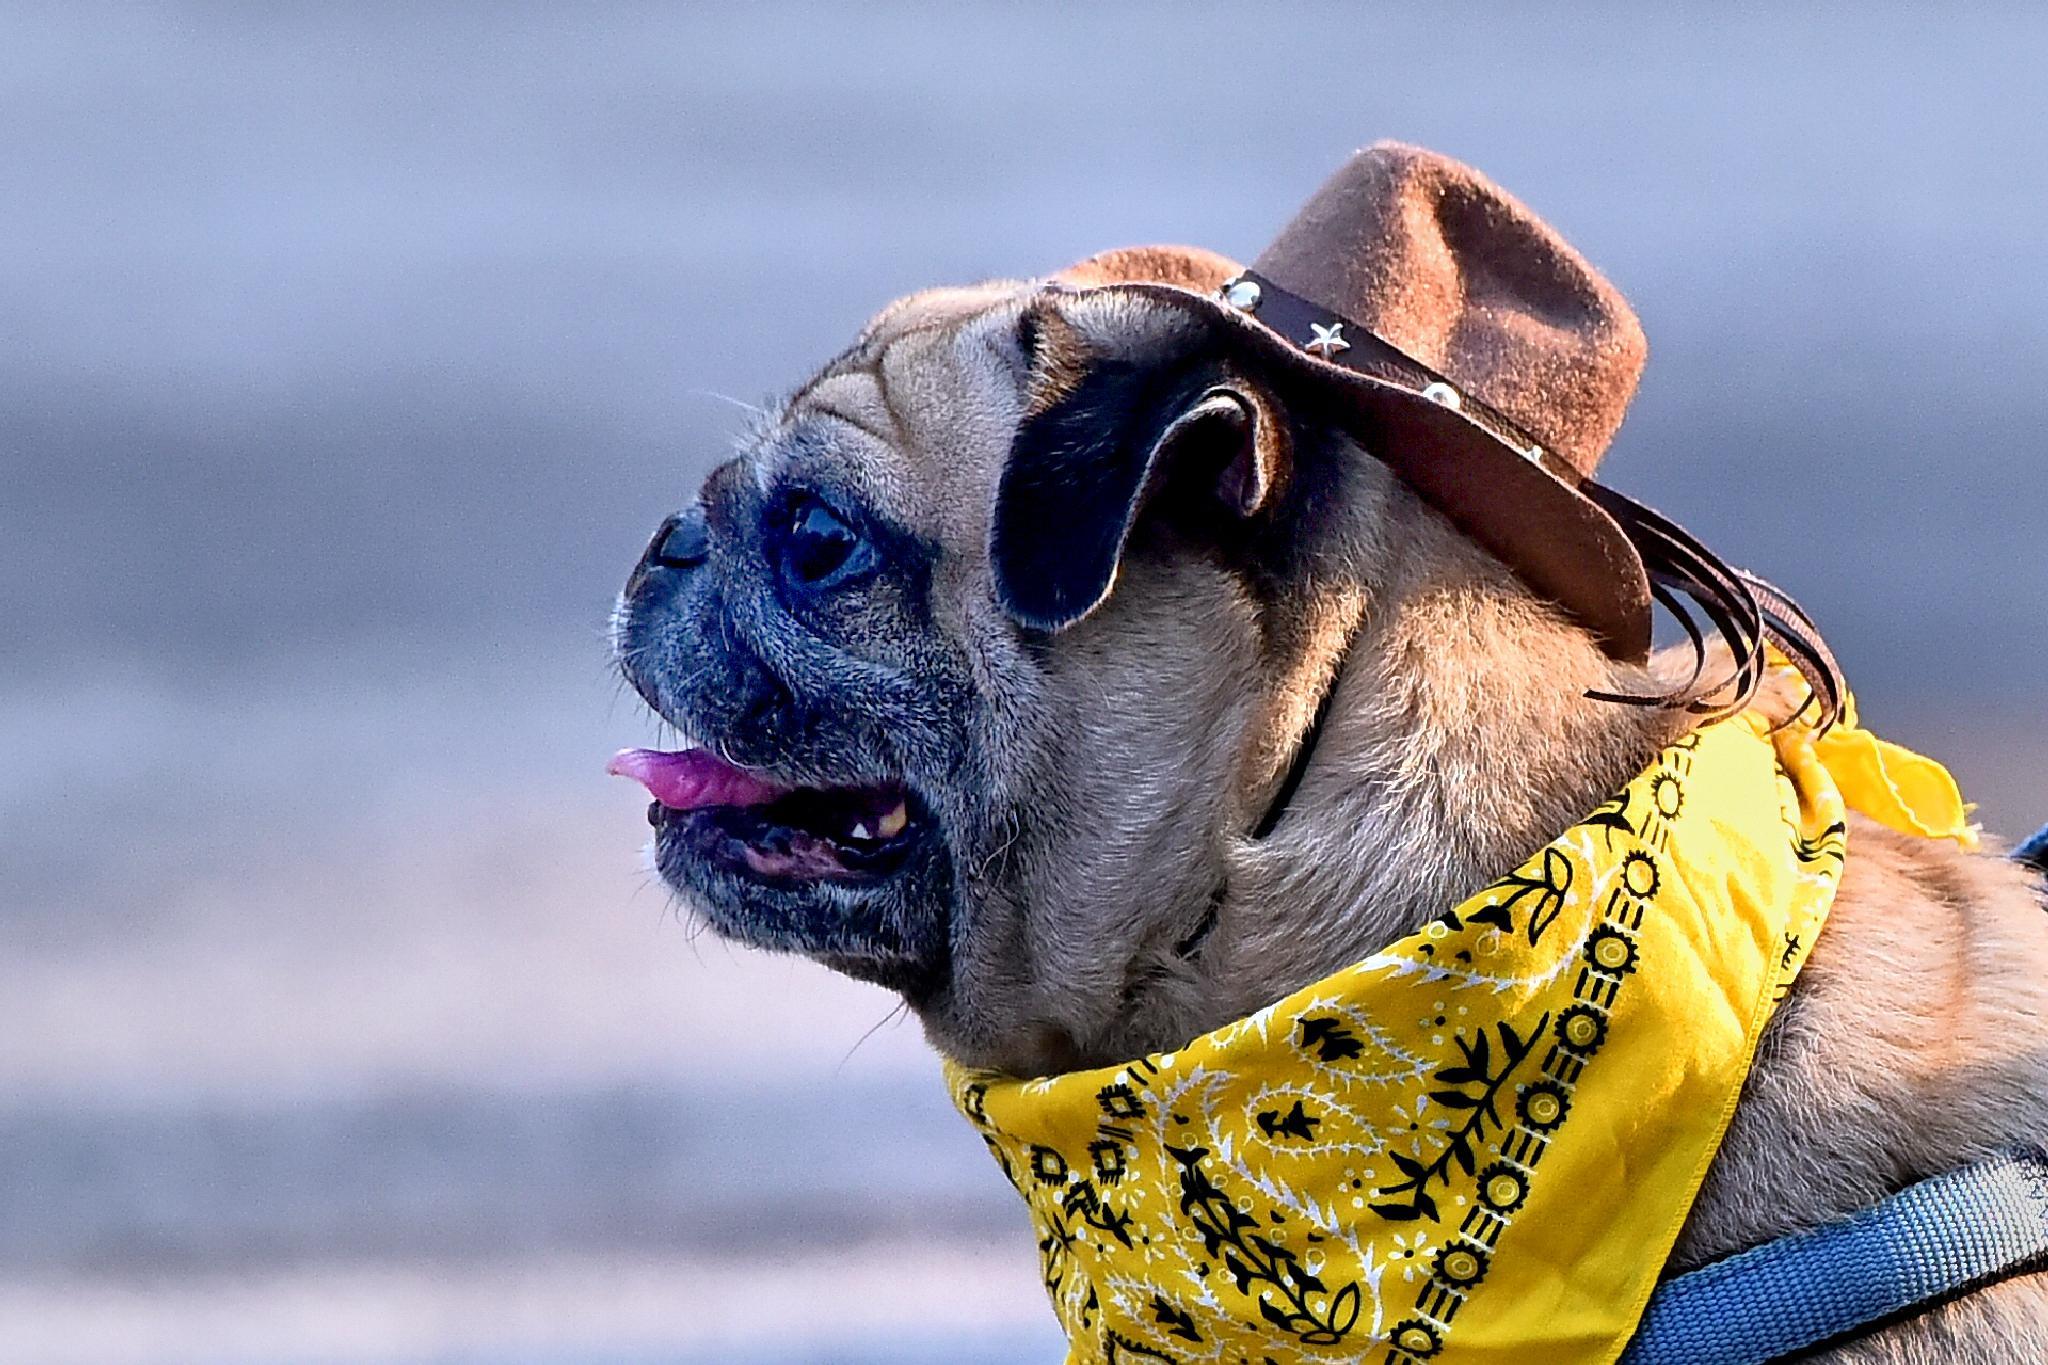 Cowboy Pug by Raymond Lee